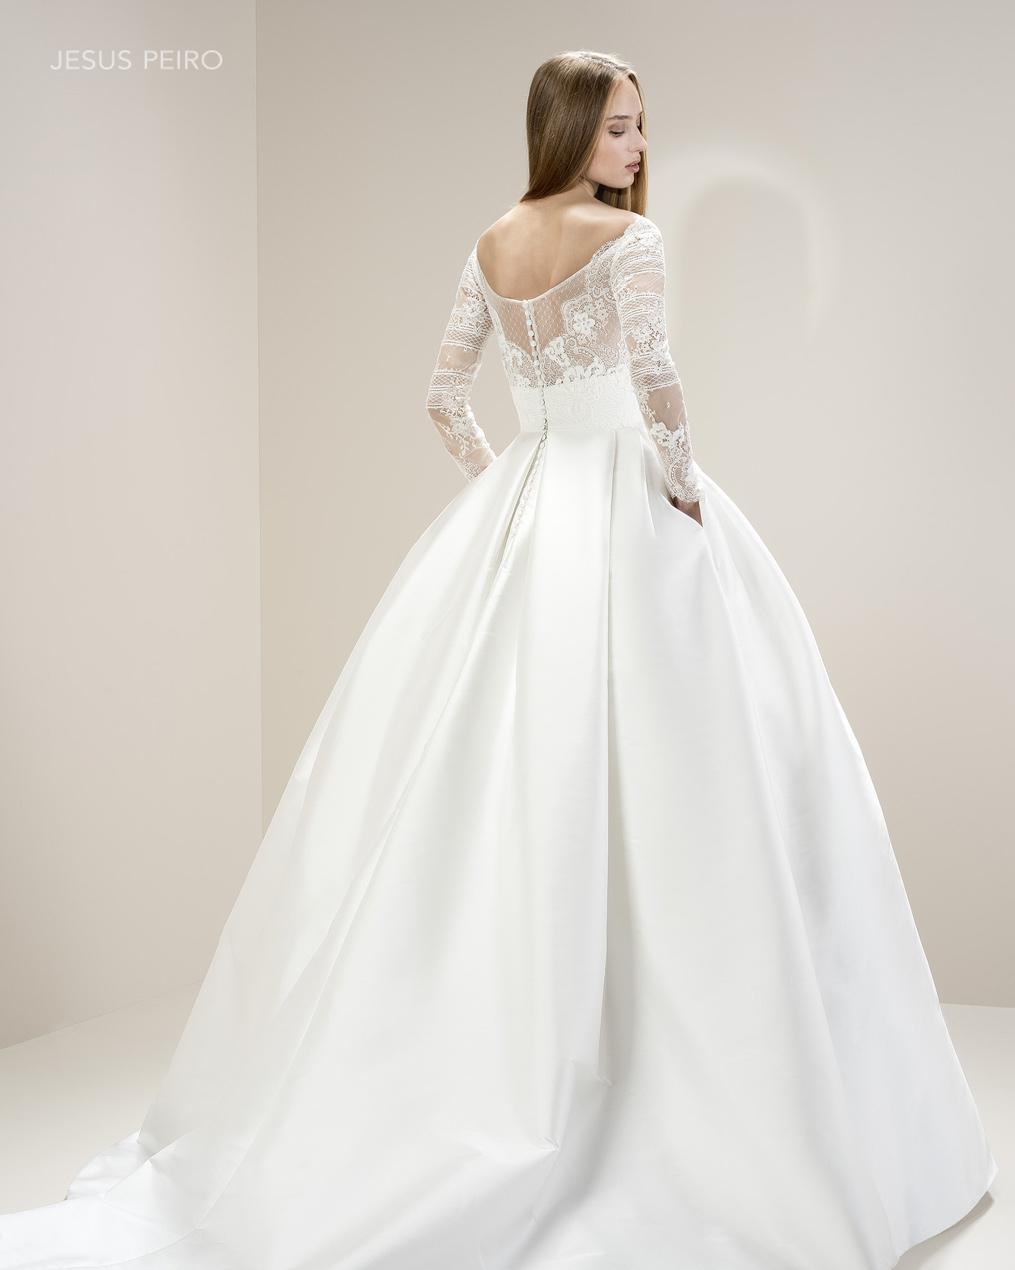 Vestido novia Jesús Peiró Ref.8004